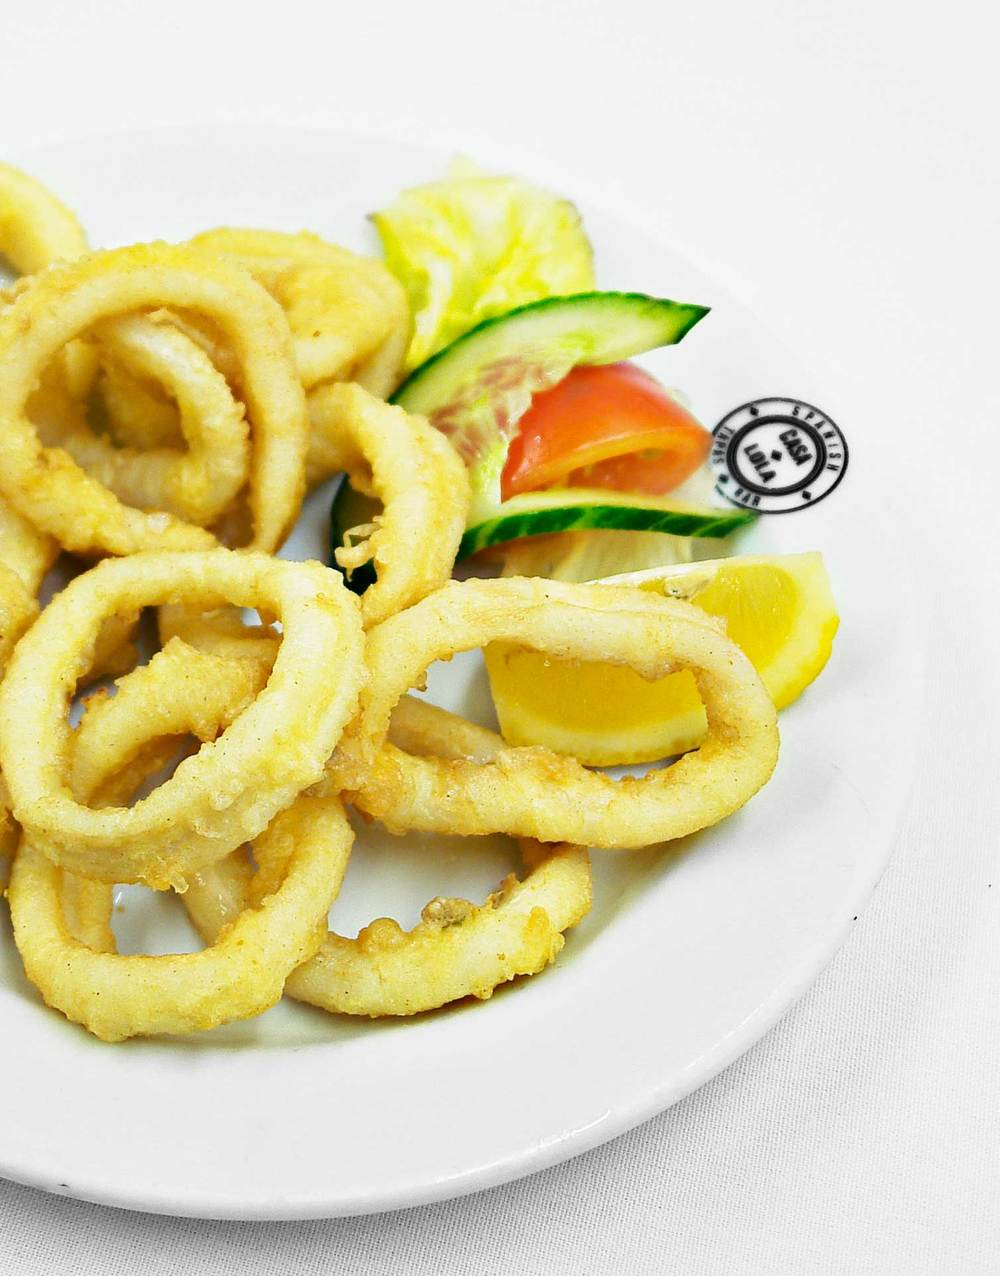 calamari.jpg